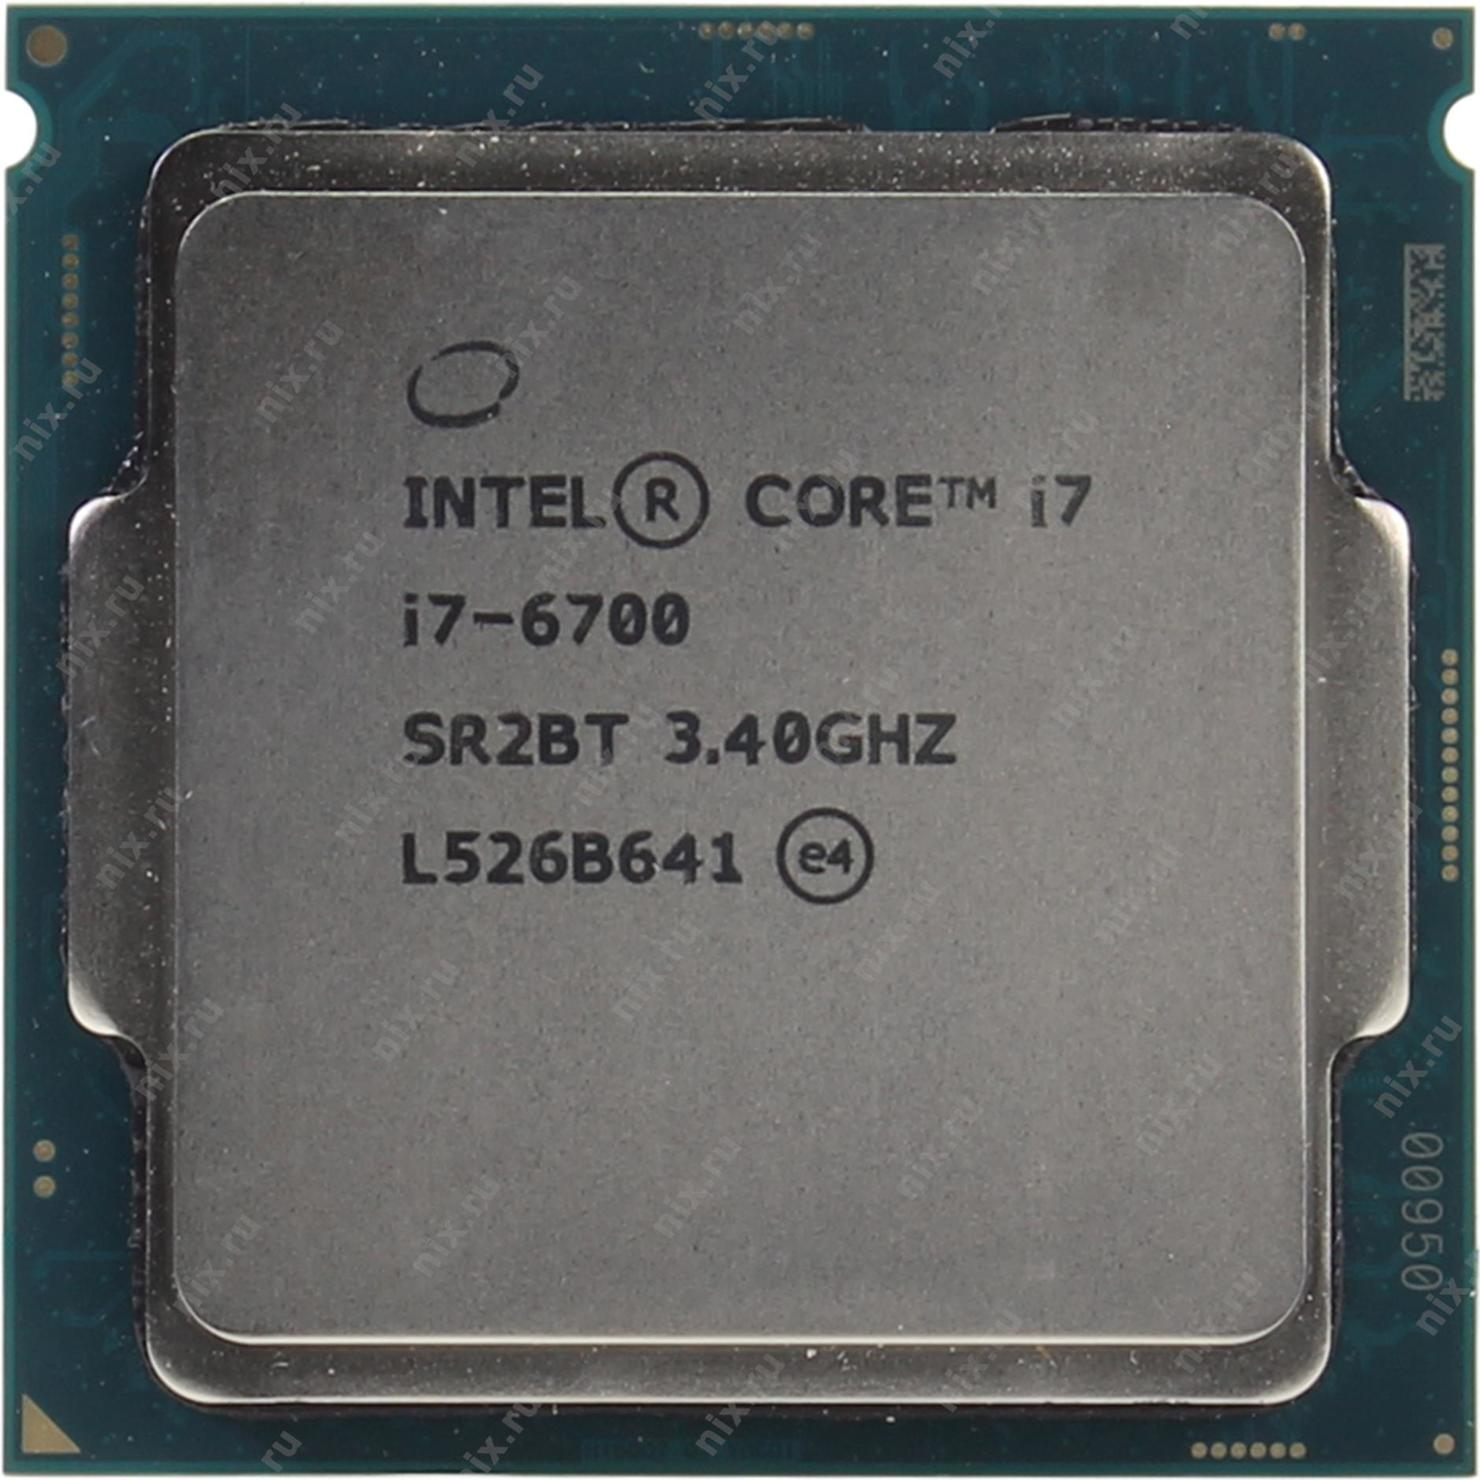 969ec4dd9229b Процессор INTEL Core i7-6700 Processor OEM — купить, цена и характеристики,  отзывы